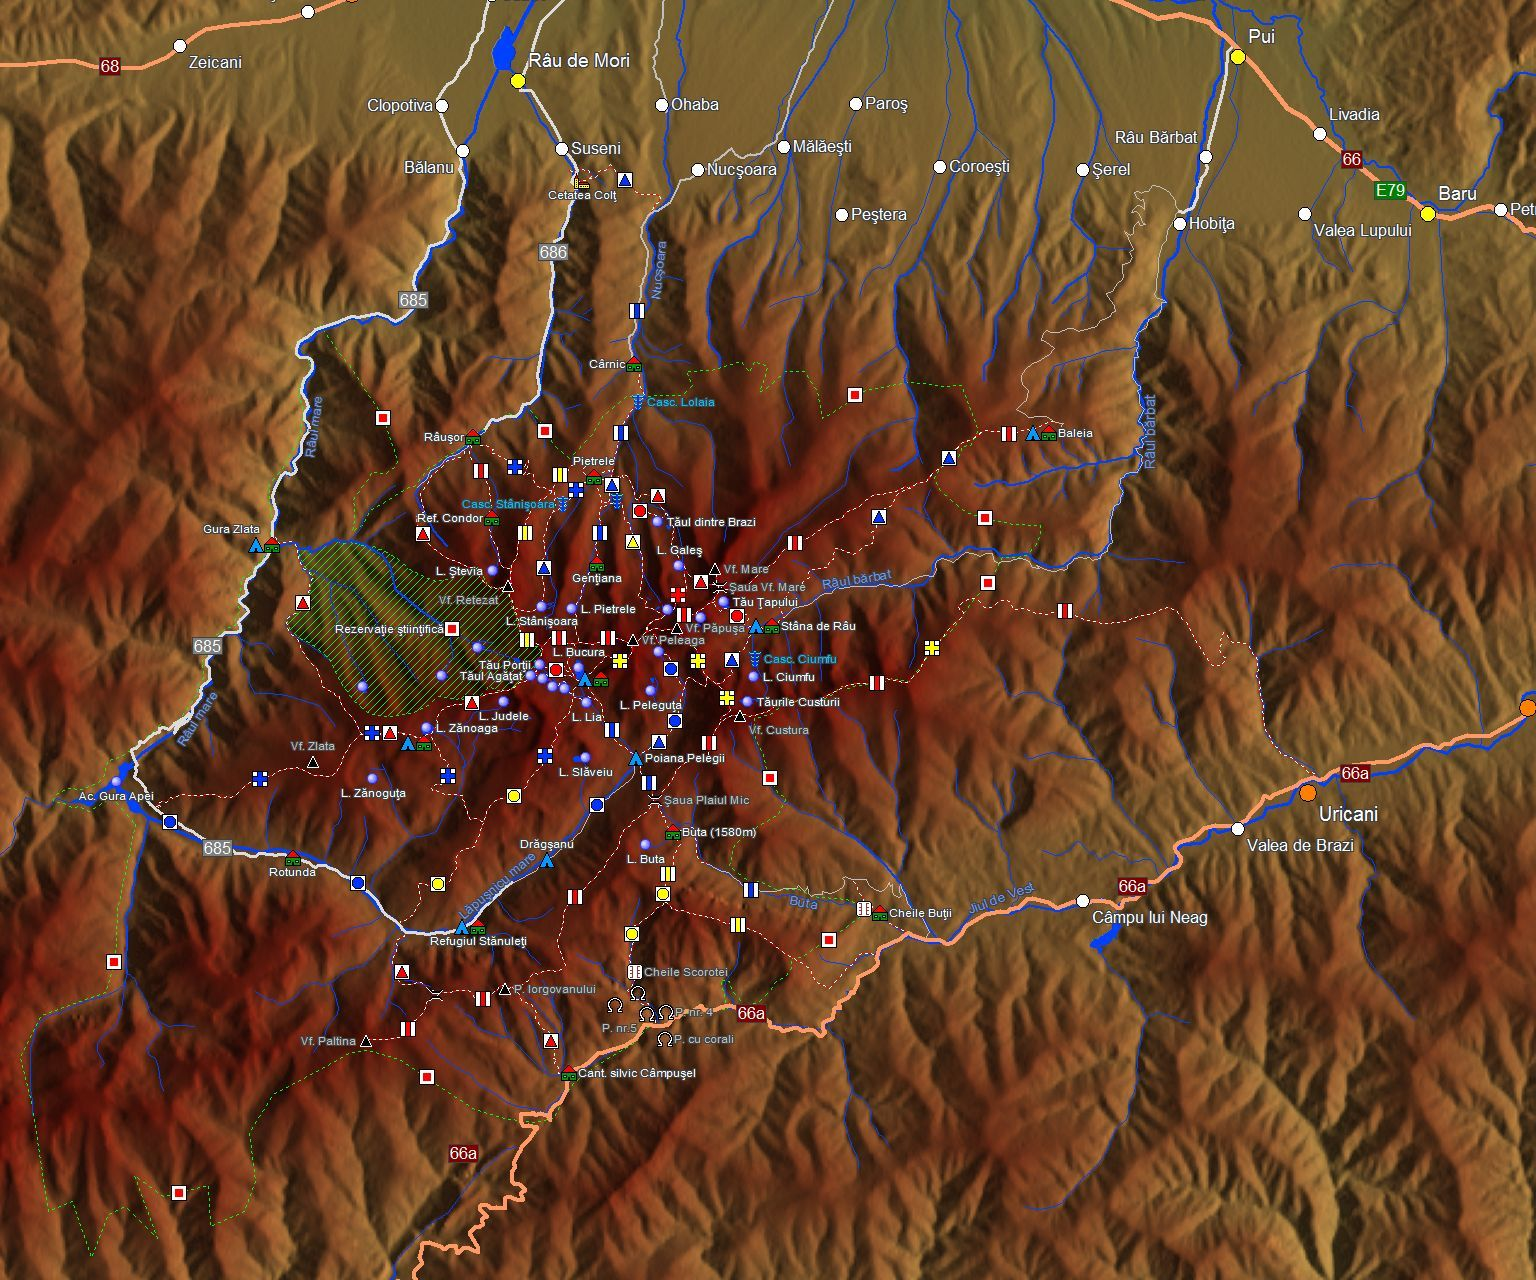 Muntii Retezat Harta Interactiva Trasee Marcate Si Obiective